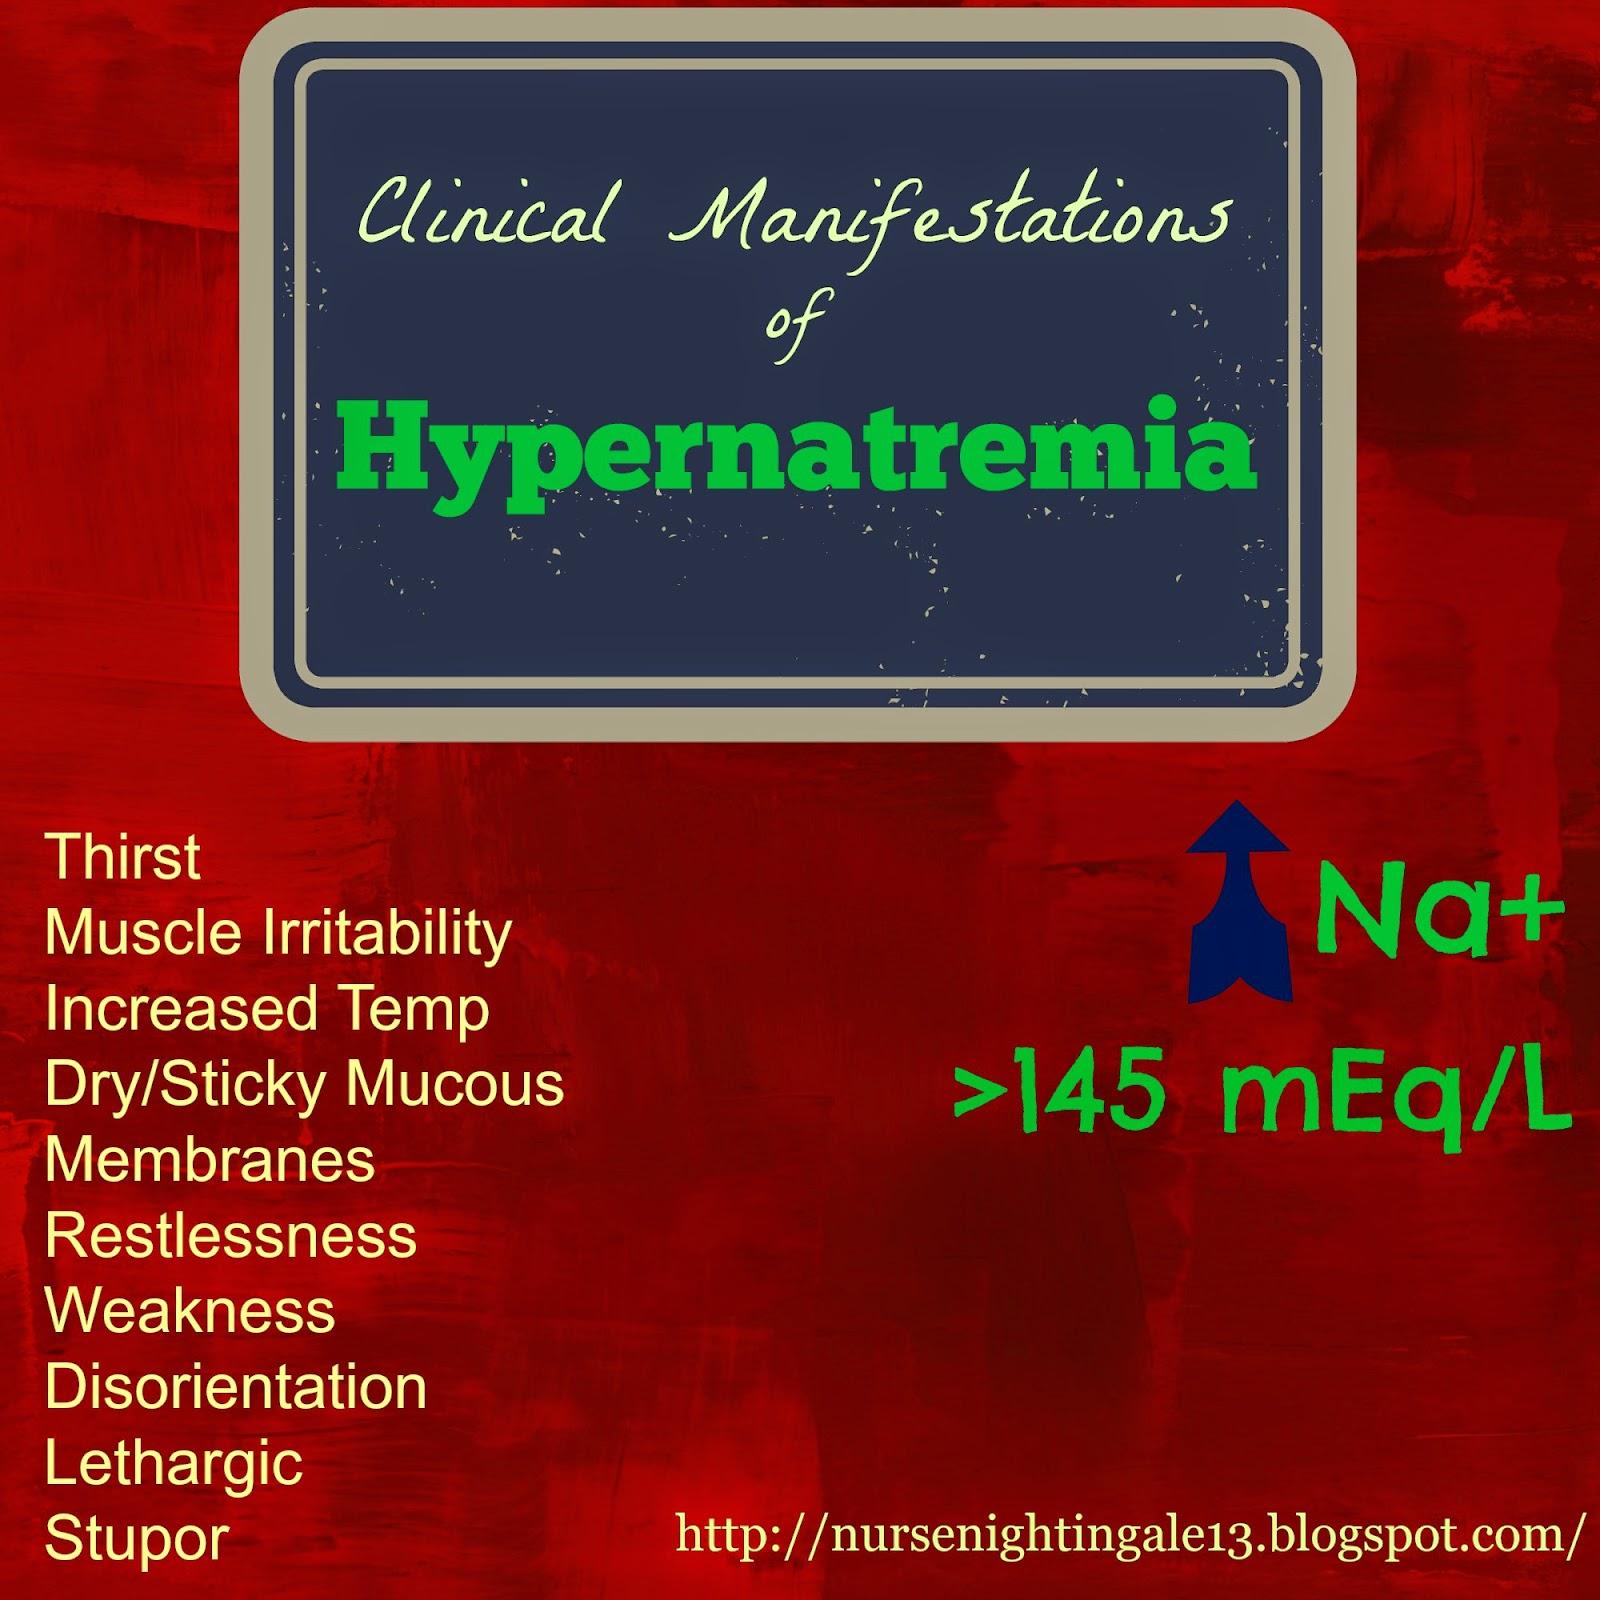 Nurse Nightingale: Clinical Manifestations of Hypernatremia